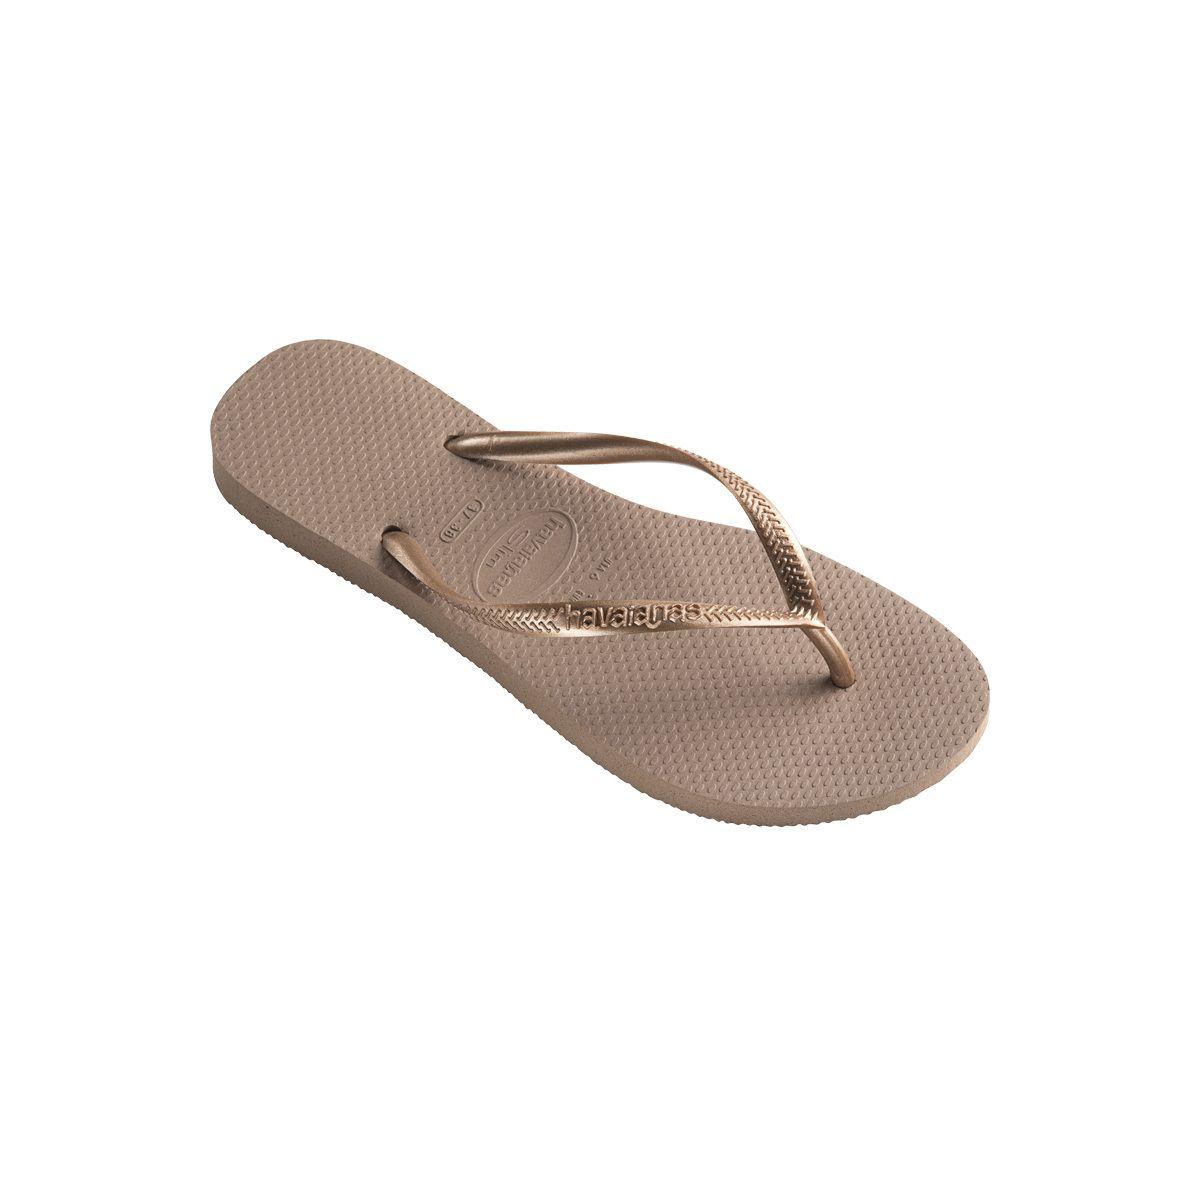 Women's Slim Thong Flip Flop Sandal | Havaianas